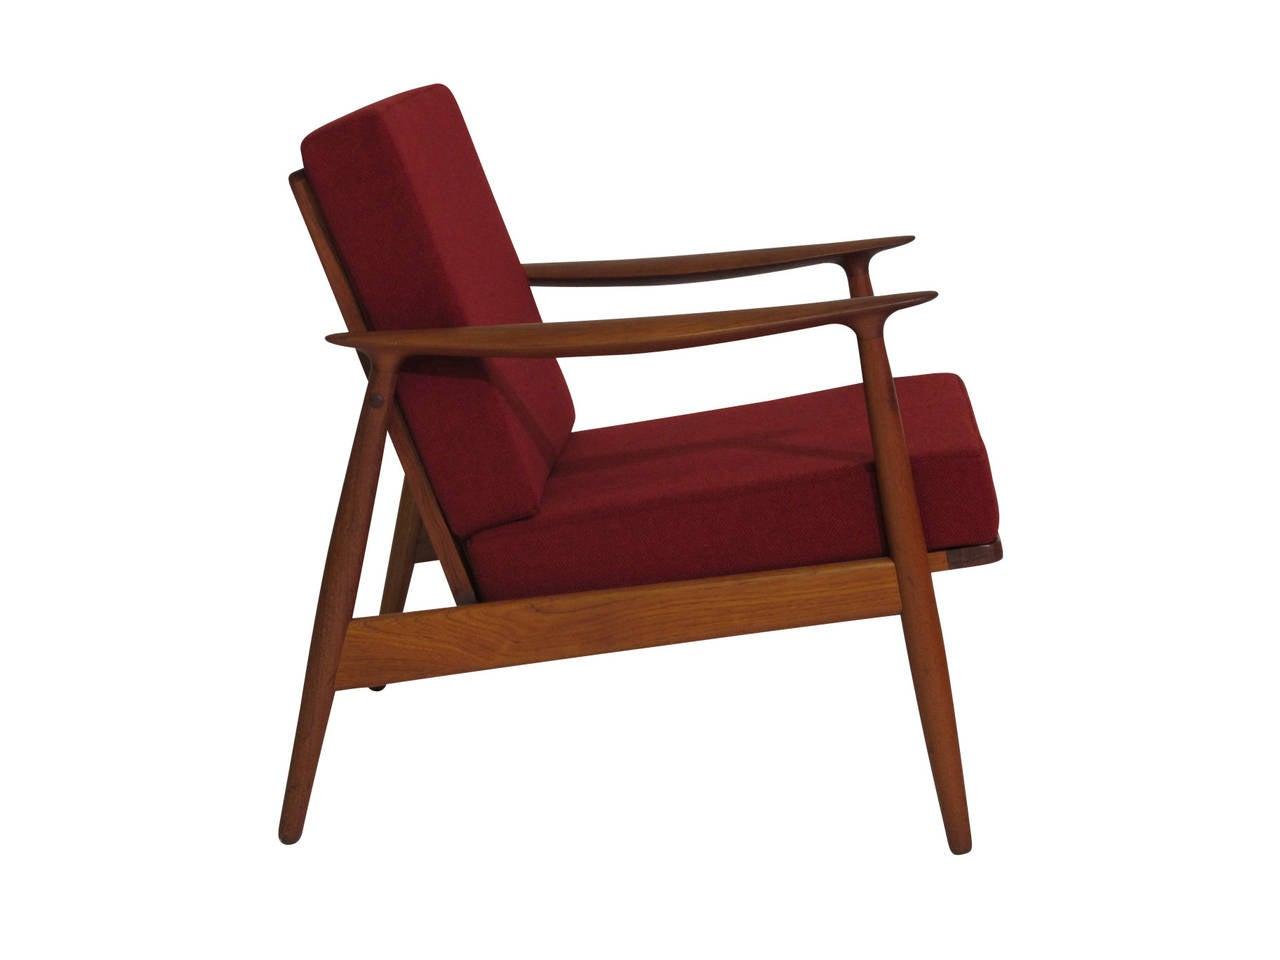 teak lounge chair steel drawing danish at 1stdibs